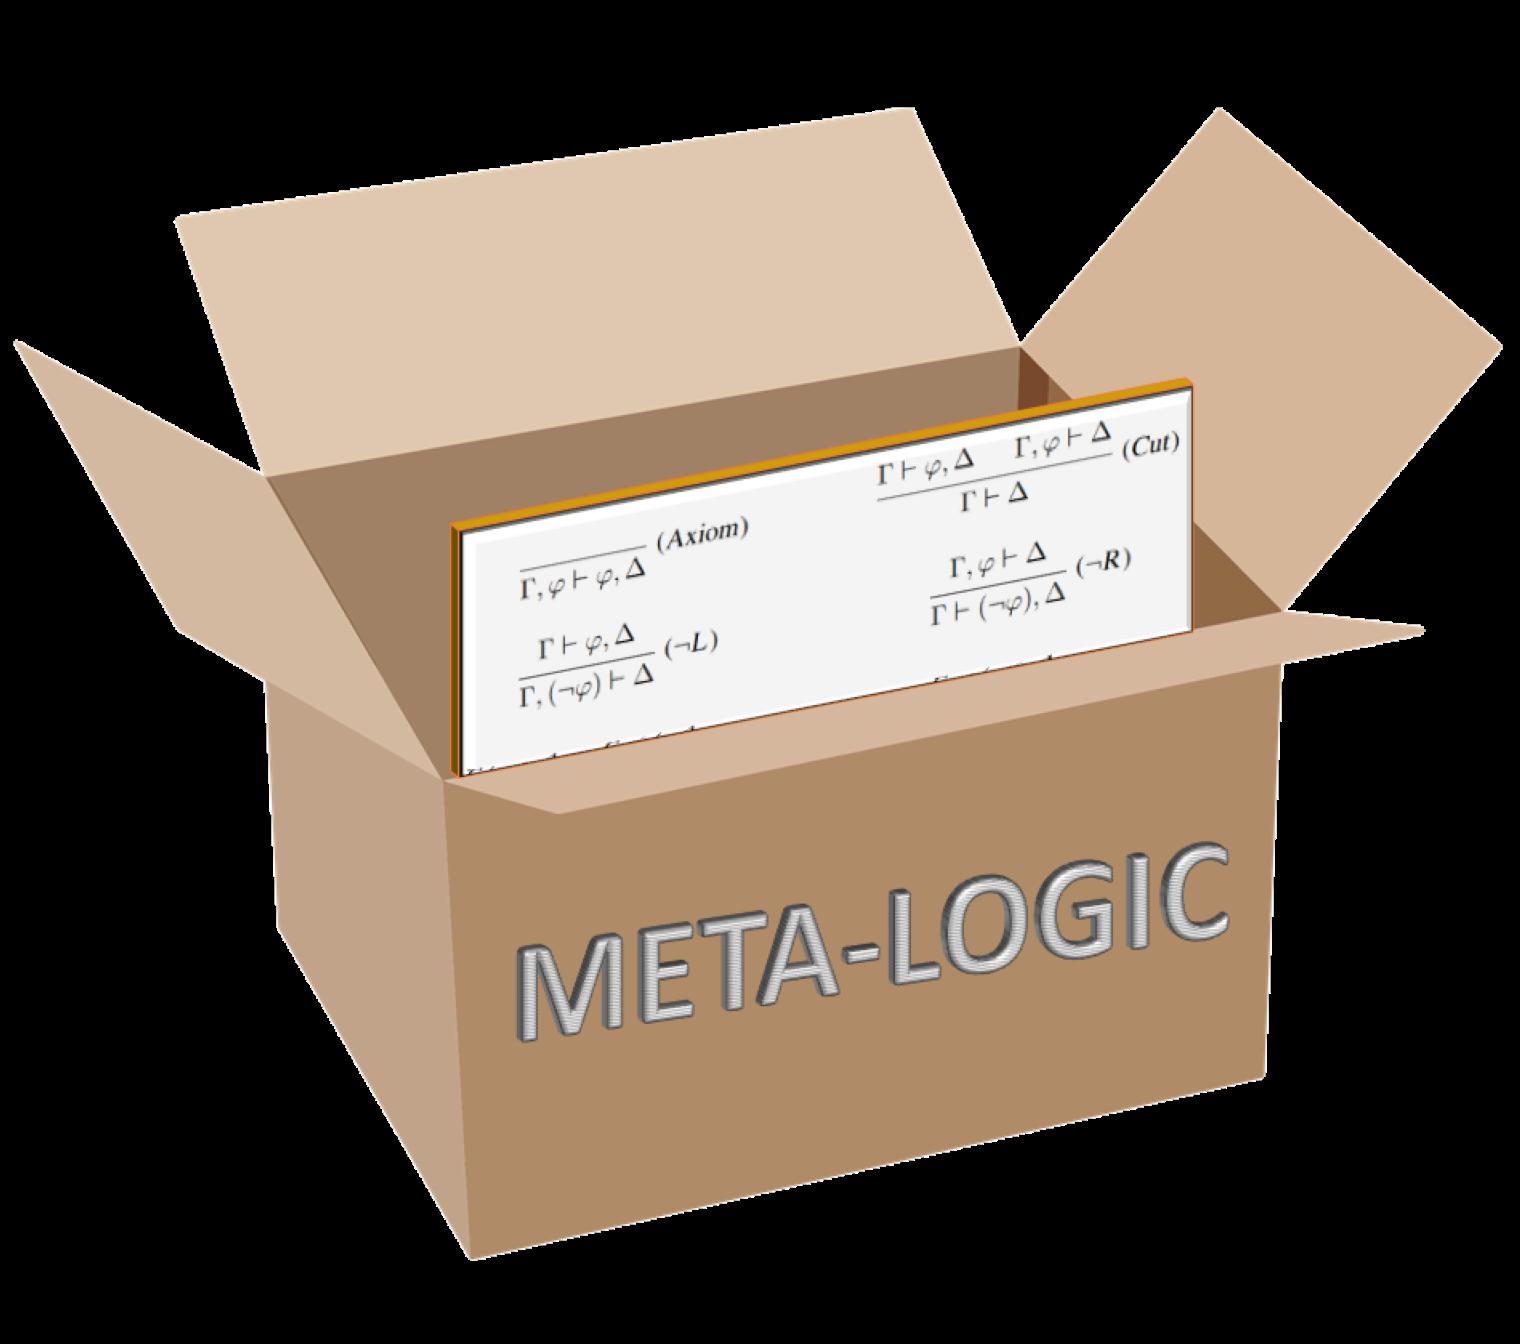 Embedded logics